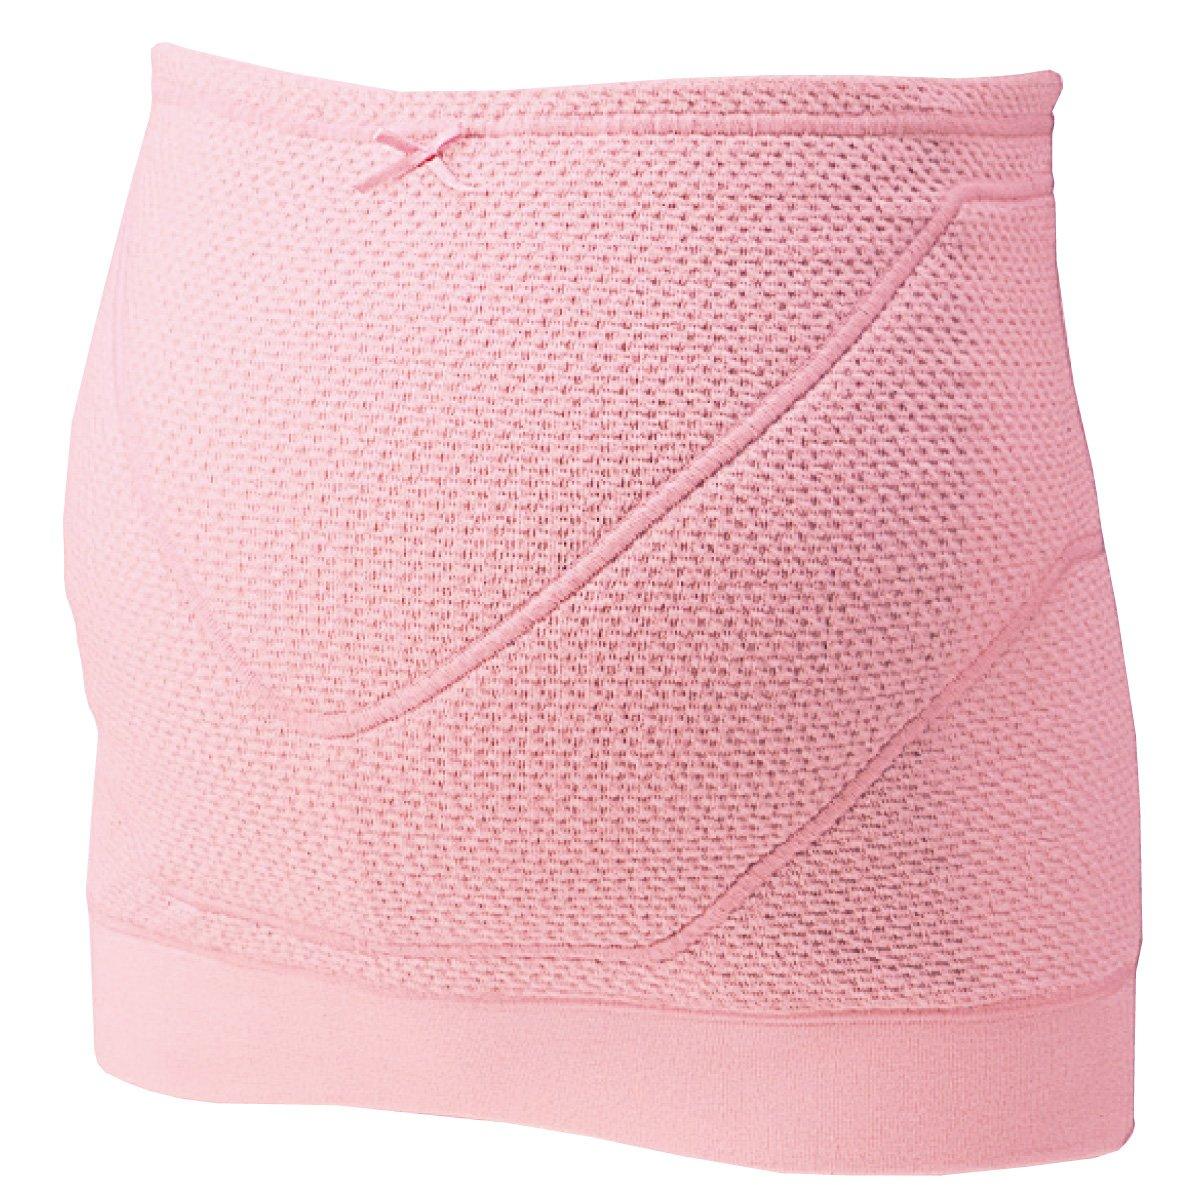 FUN fun Women's Inujirushi Honpo Maternity Pregnancy Belt Belly Band Cotton Electromagnetic Wave Shield Type M Pink